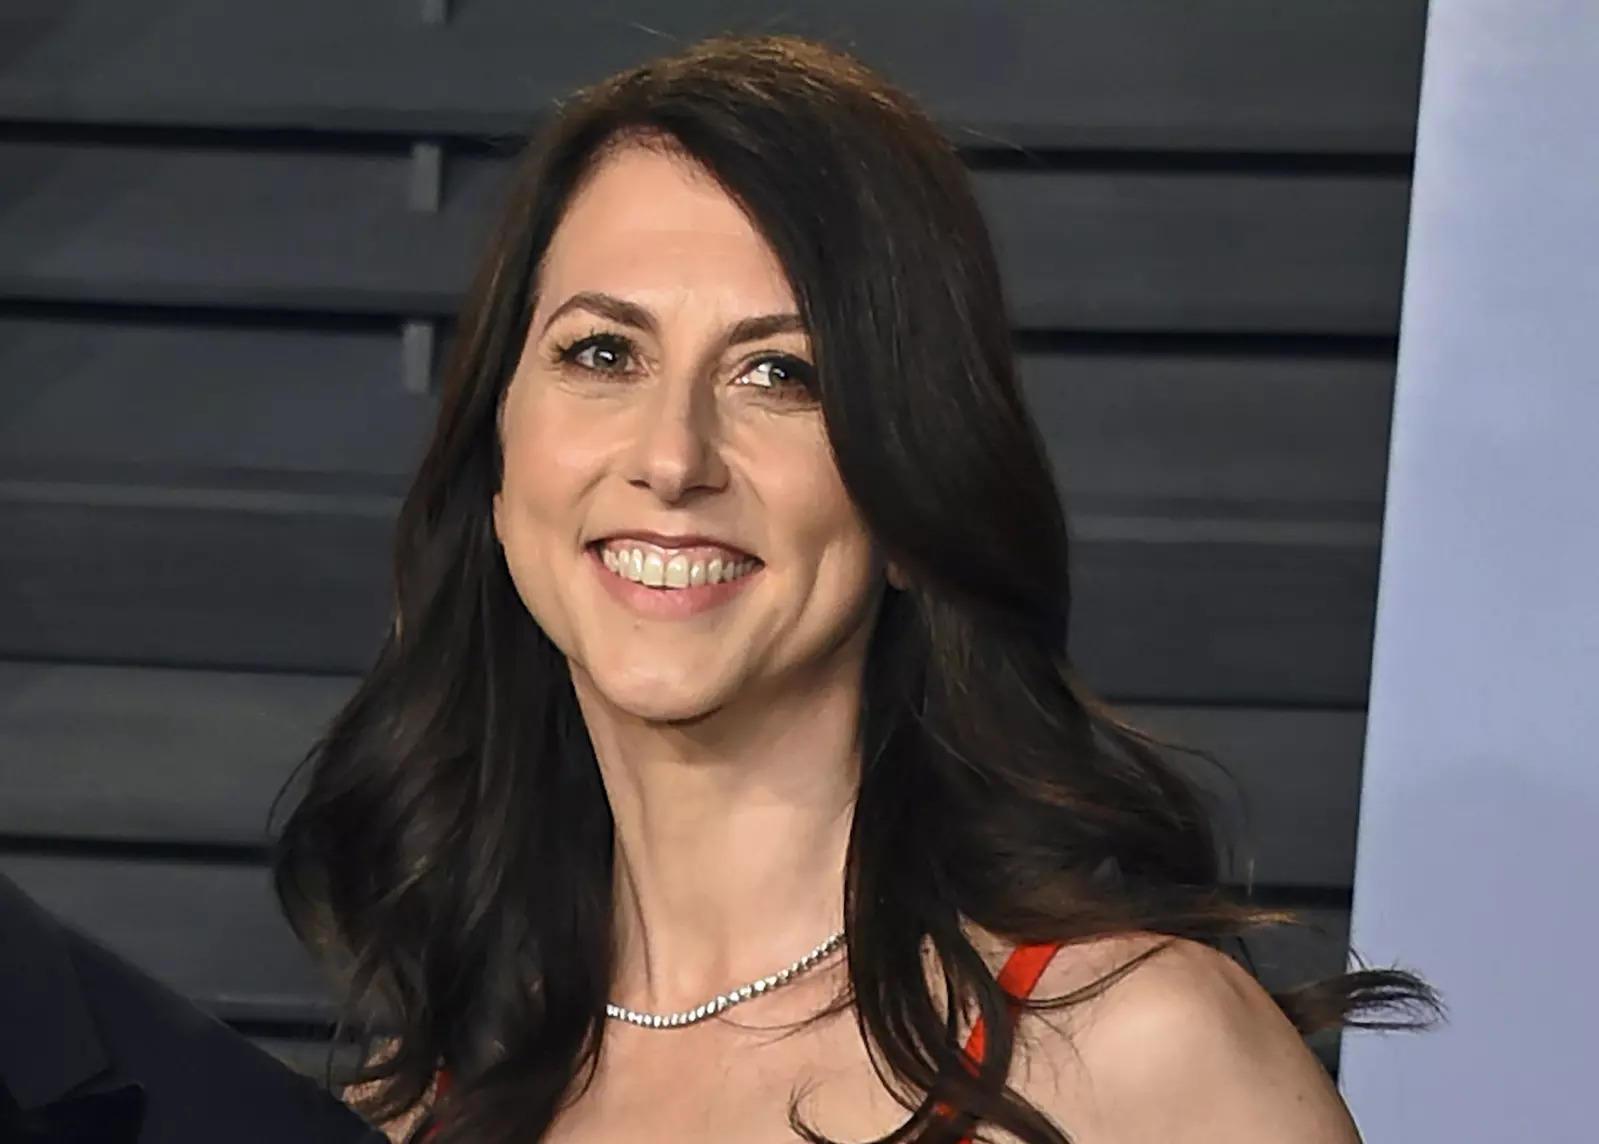 Jeff Bezos's ex-wife Mackenzie Scott donates over $4 billion toward relief funds, food banks